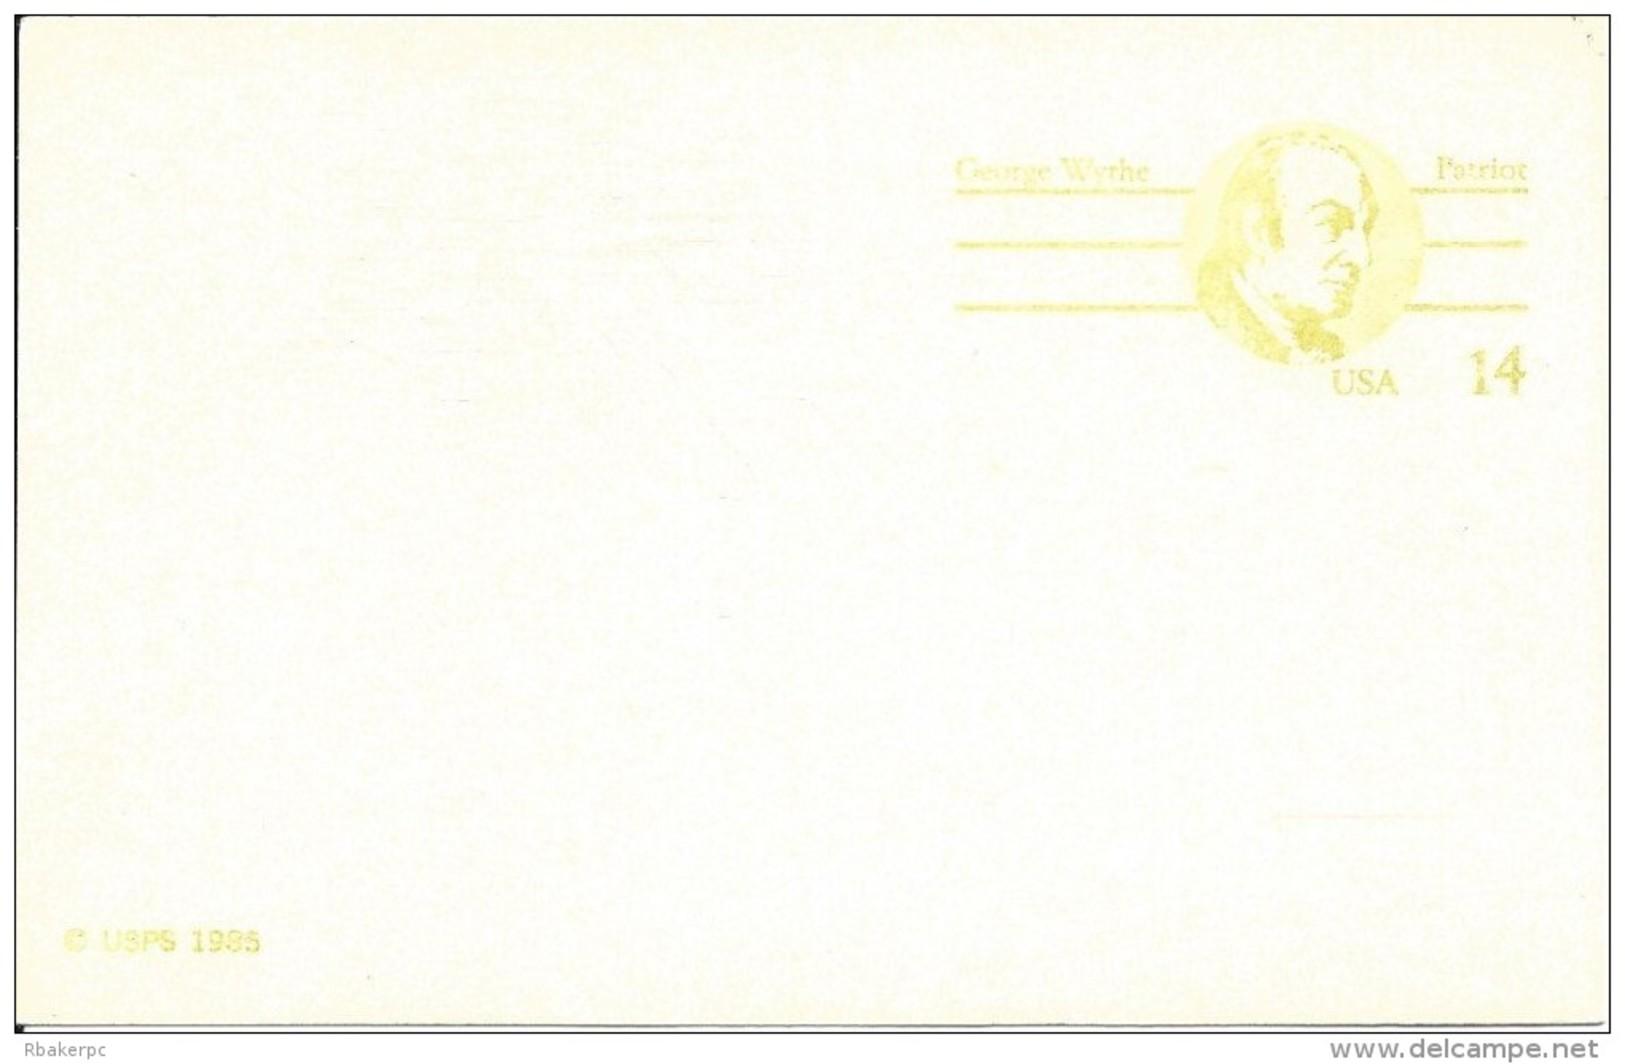 USA Postal Card - 1985 - George Wythe - 14 Cent Card - UNUSED - Postal Stationery